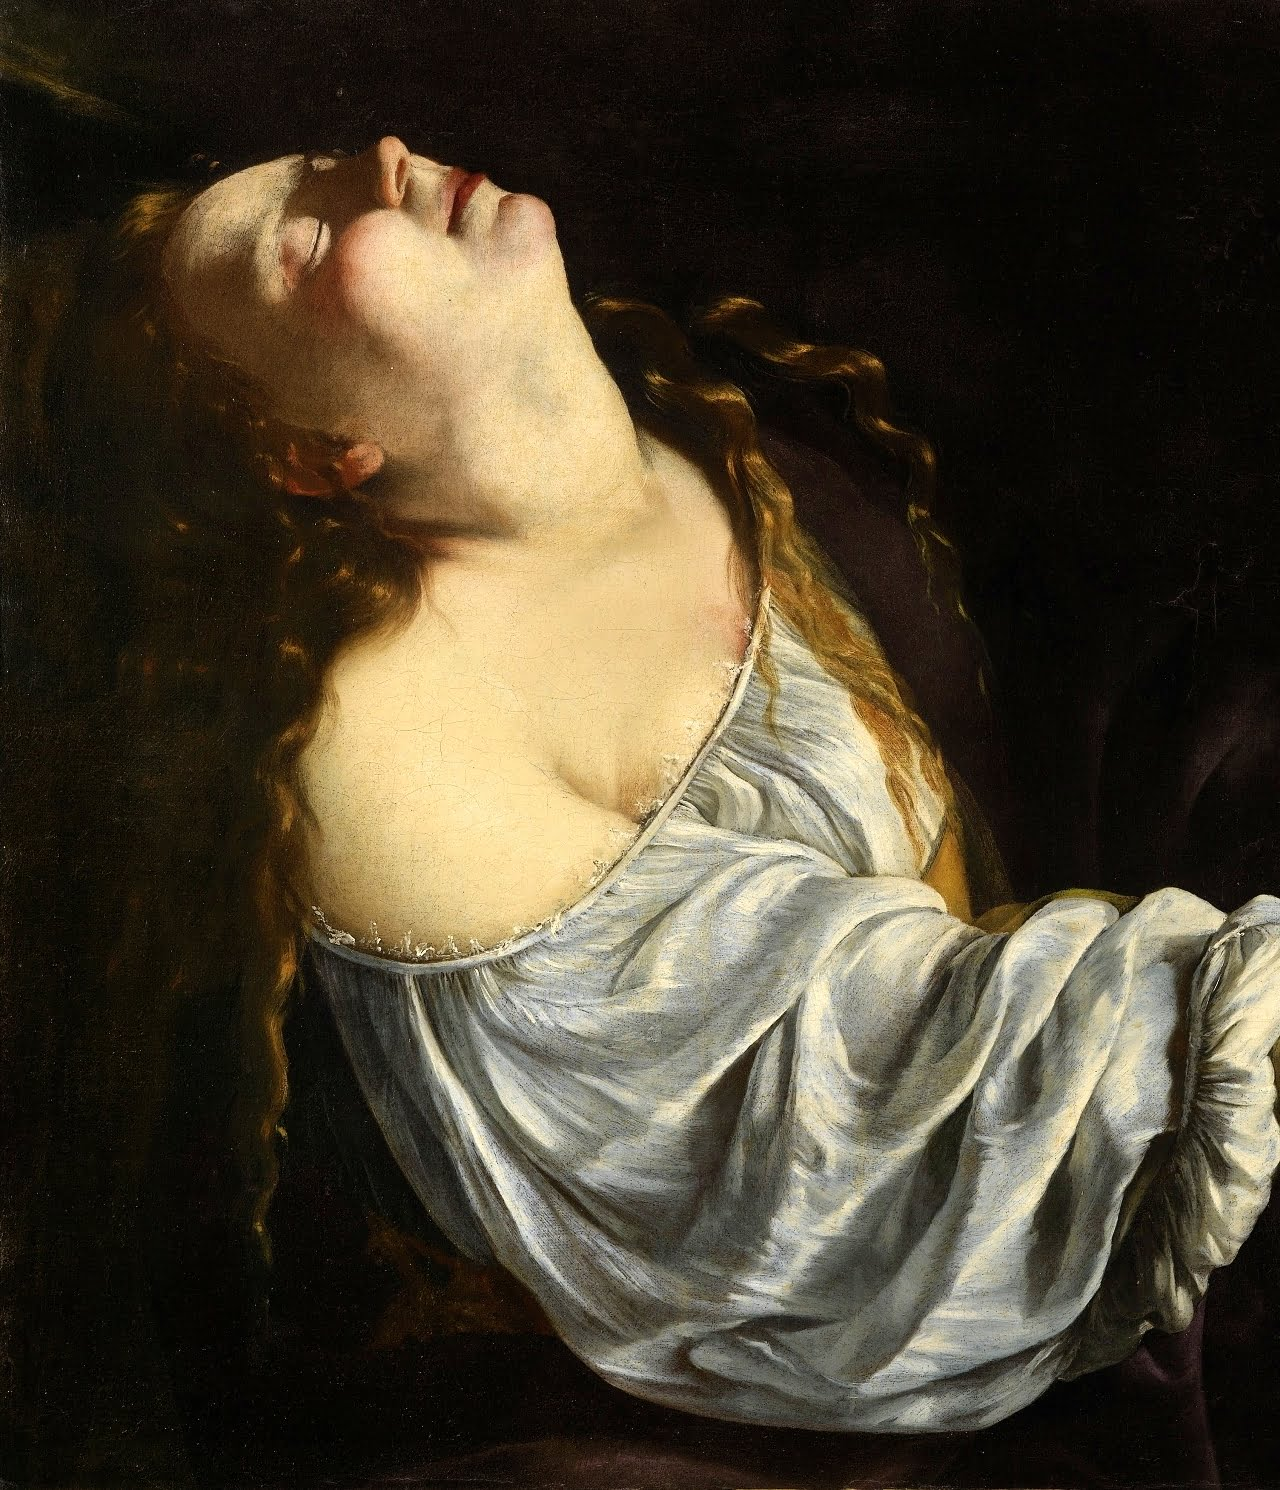 Artemisia Gentileschi / Артемизия Джентилески (1593-1653) - Maria Maddalena in estasi  / Мария Магдалина в экстазе (1613-1620)